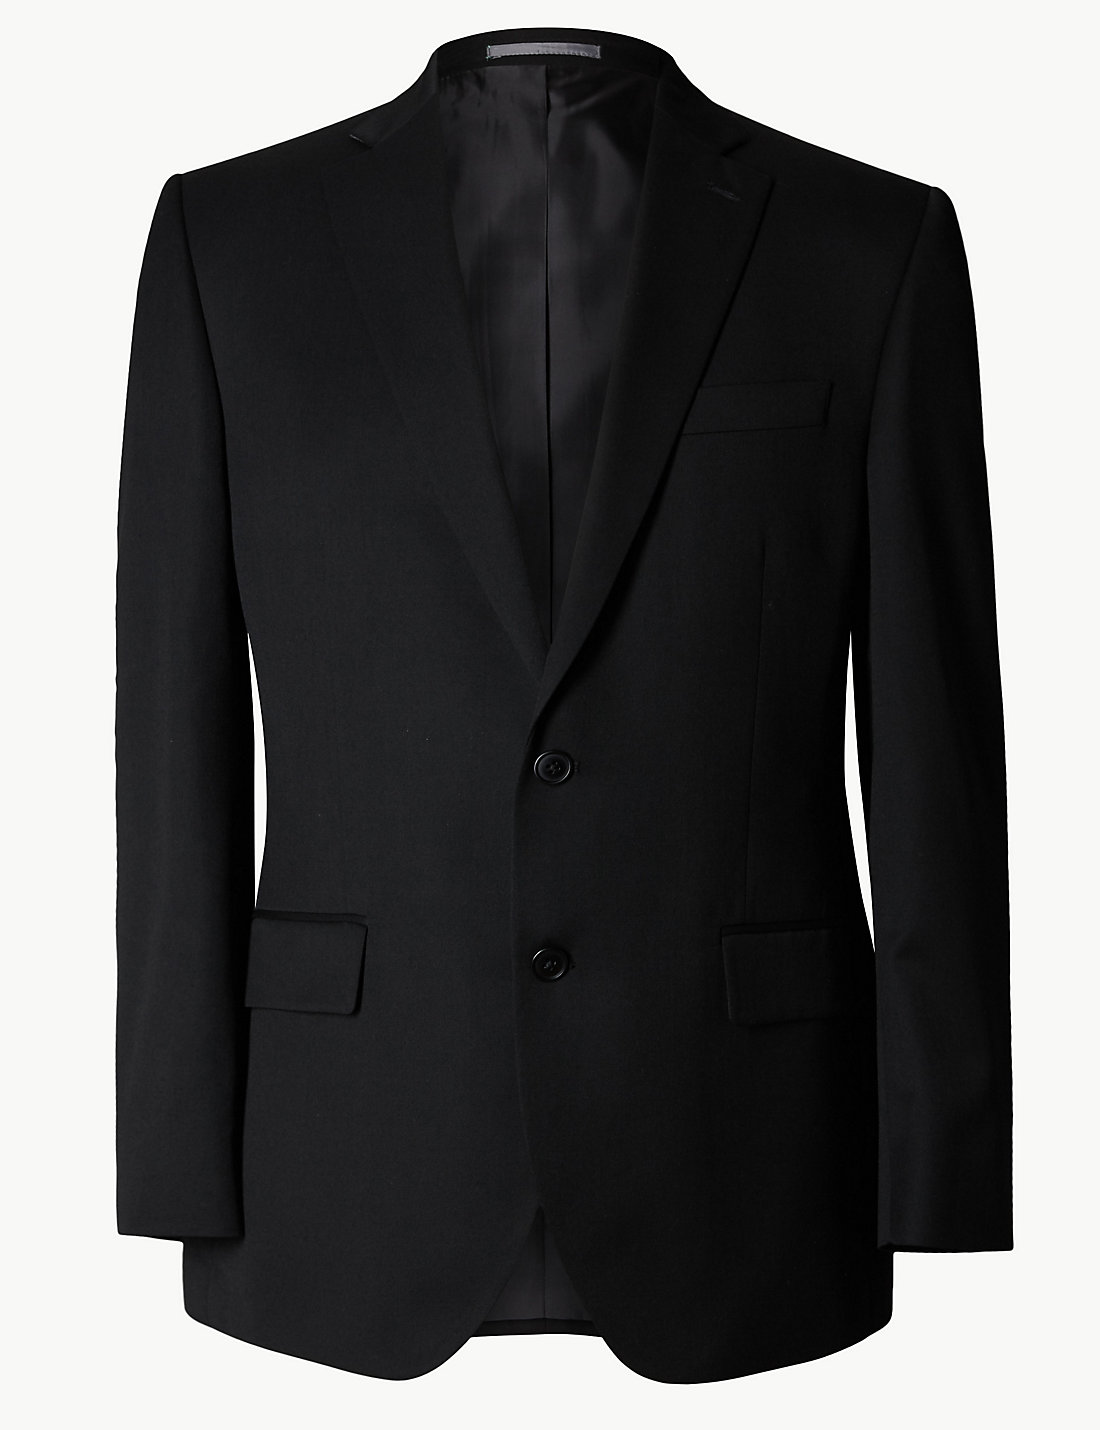 Black slim fit suit ms black slim fit suit izmirmasajfo